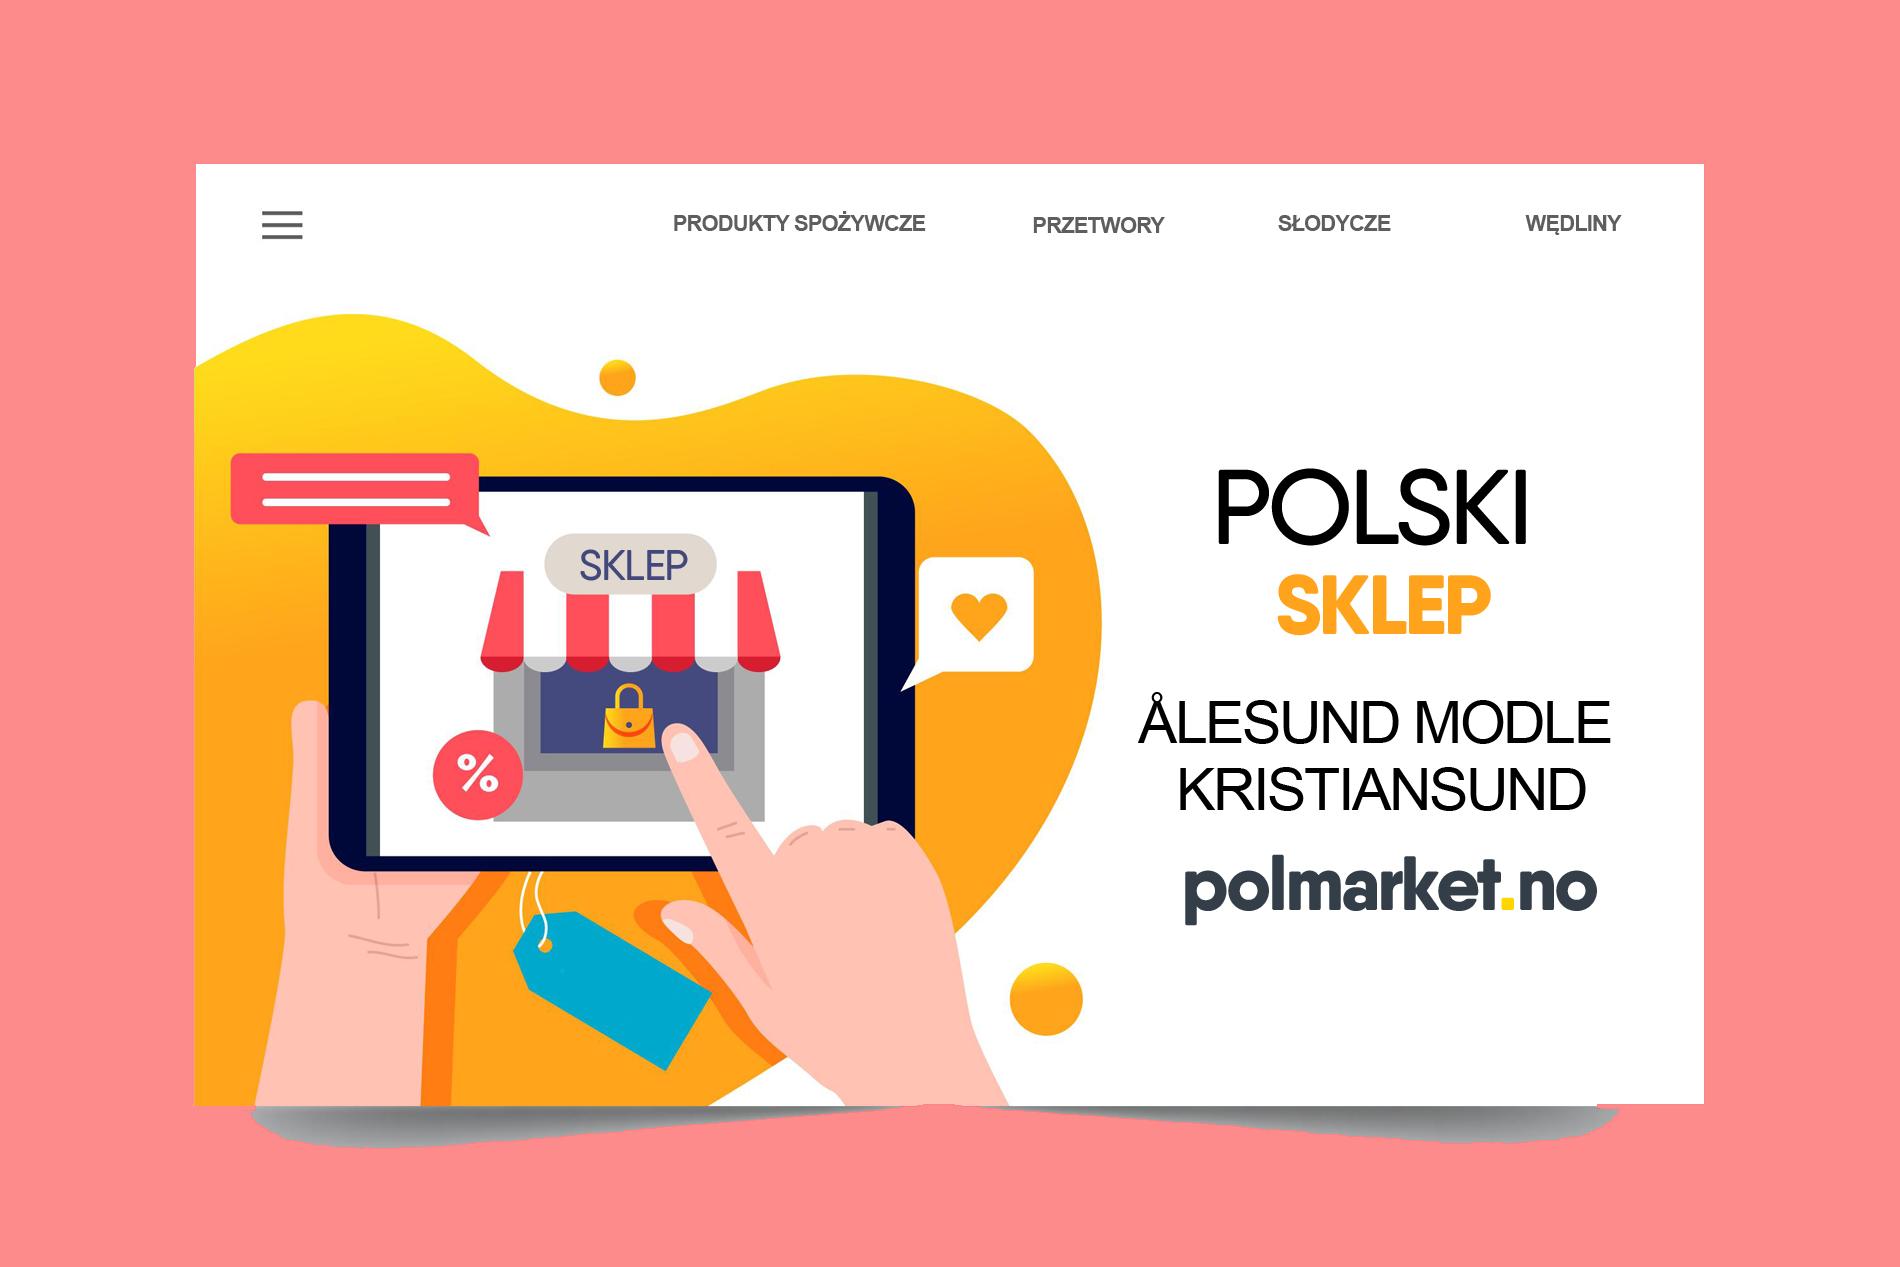 Polski sklep Ålesund Modle Kristiansund